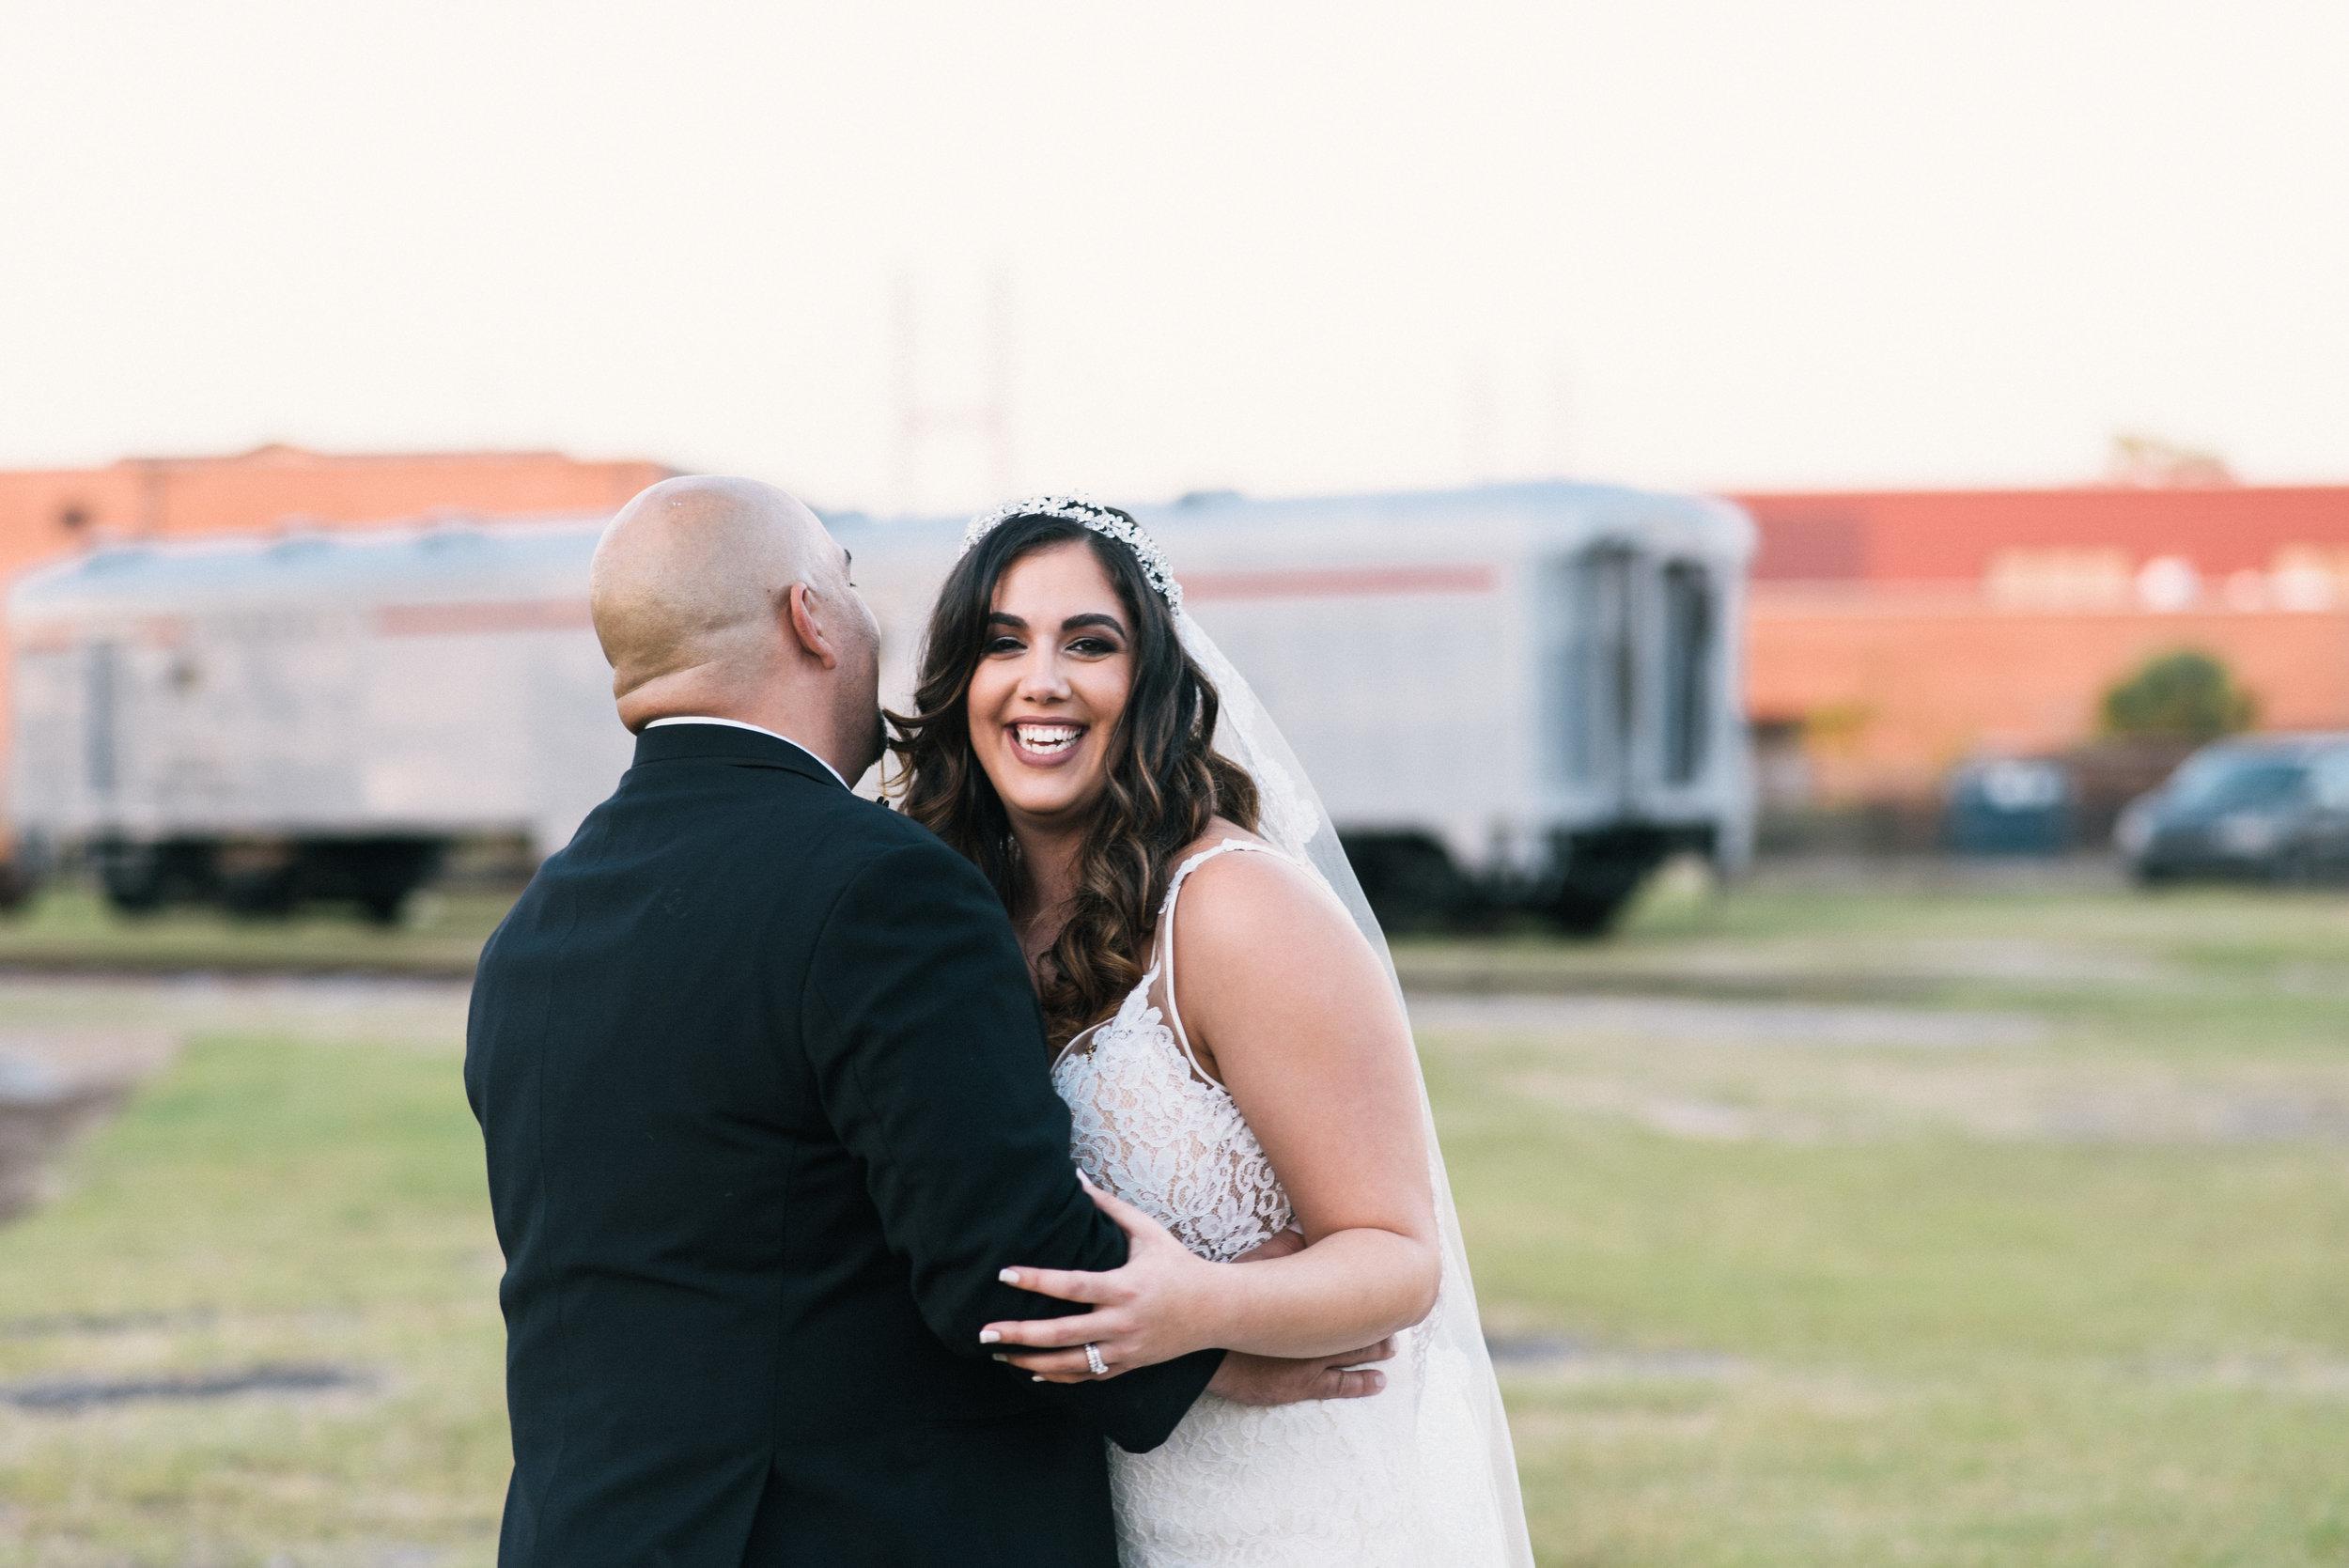 Iggy-and-yesenia-savannah-railroad-museum-wedding-meg-hill-photo- (725 of 1037).jpg